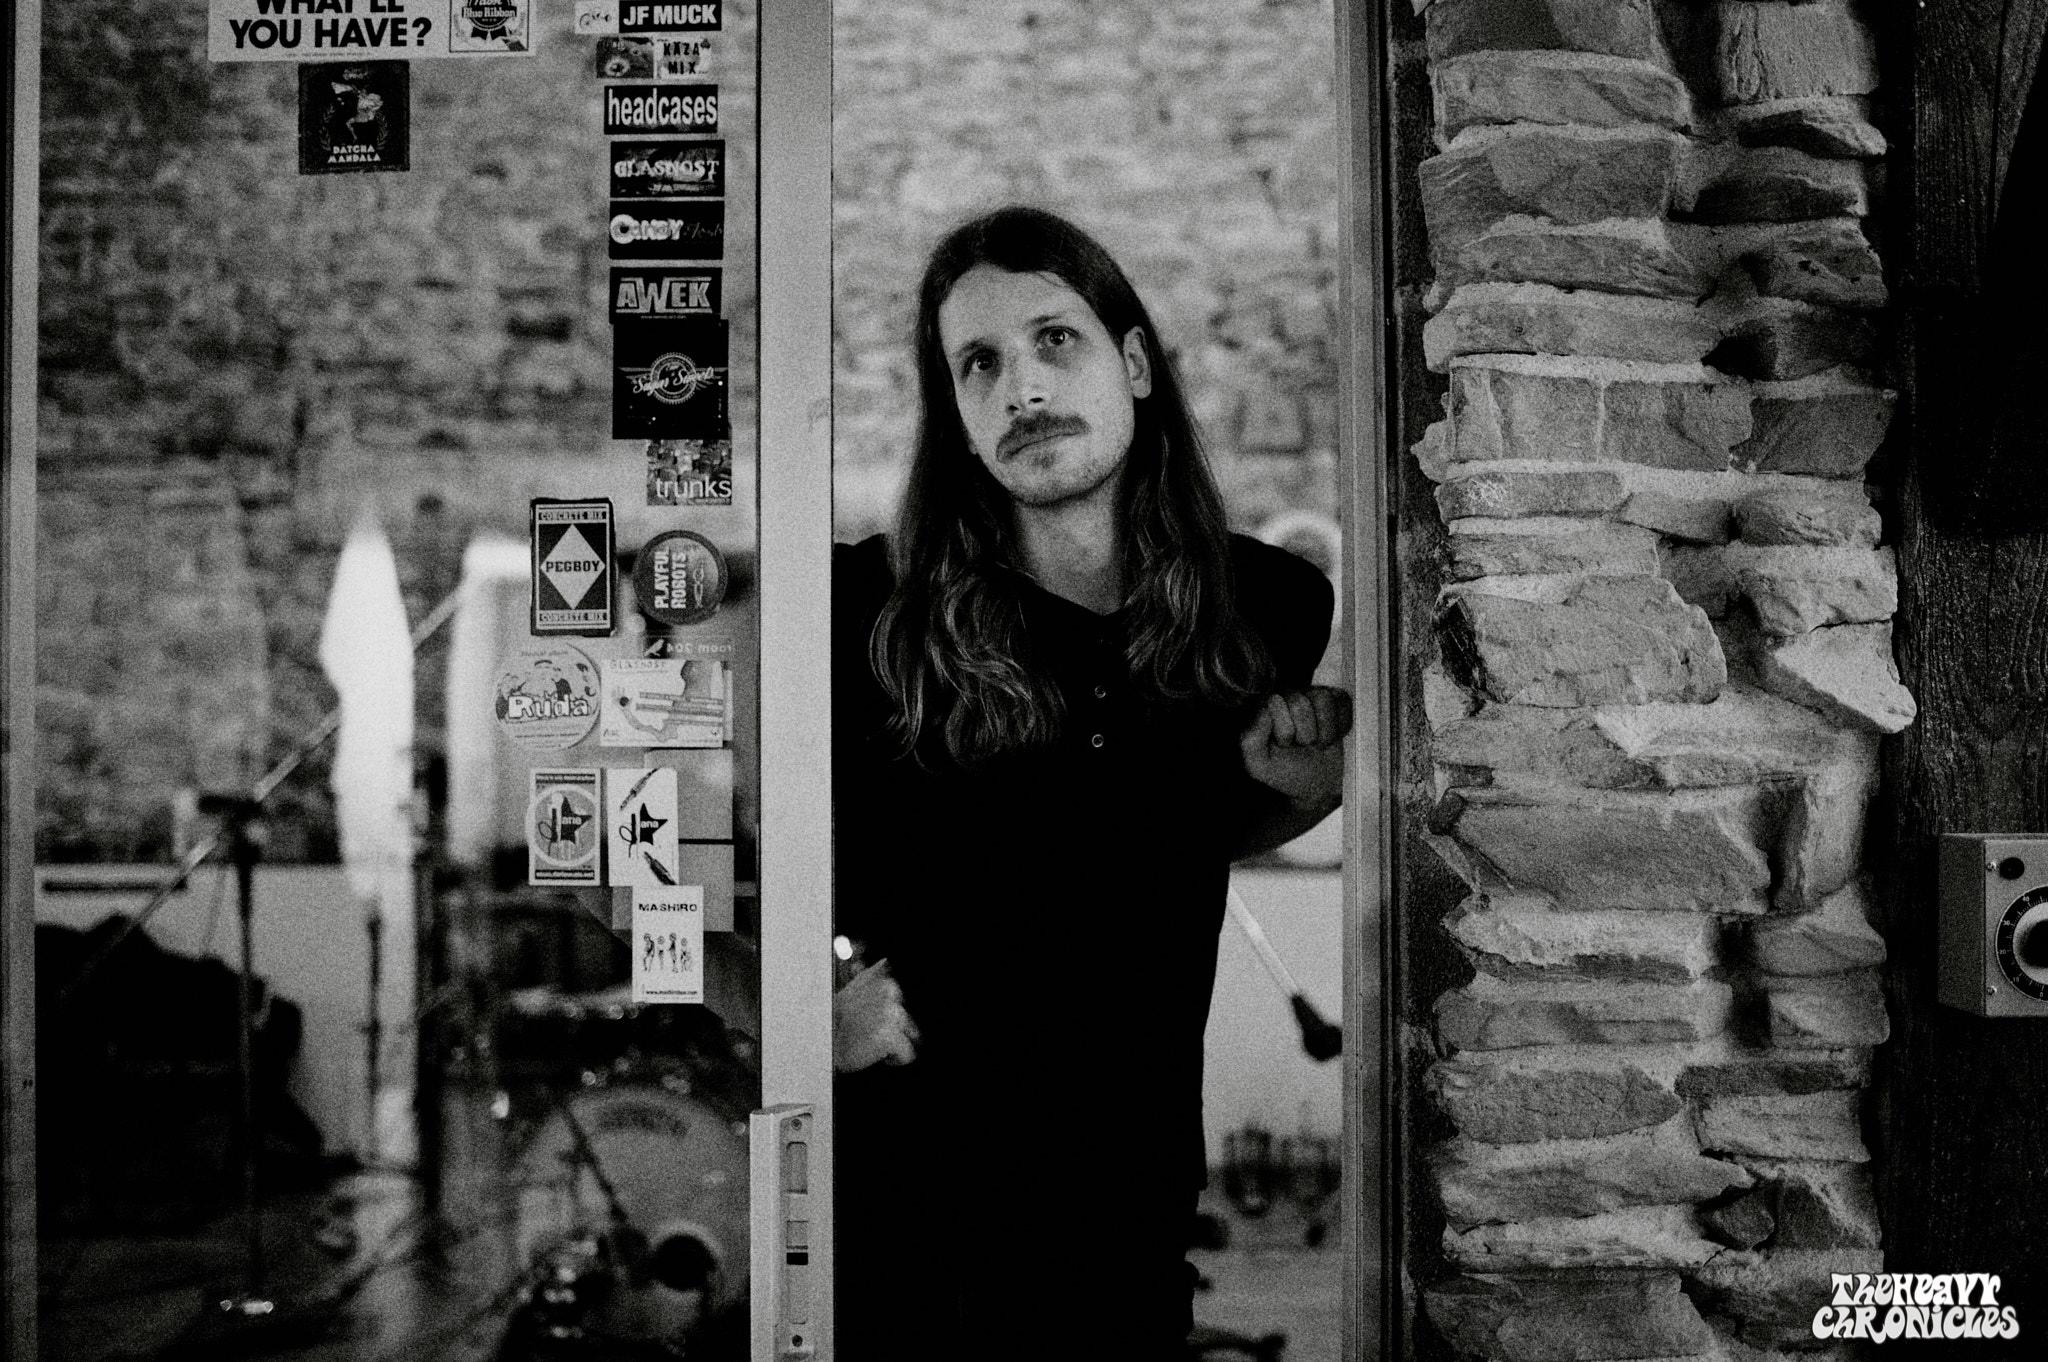 Elder-Studio-Black-Box-2019-Gael-Mathieu-The-Heavy-Chronicles-112